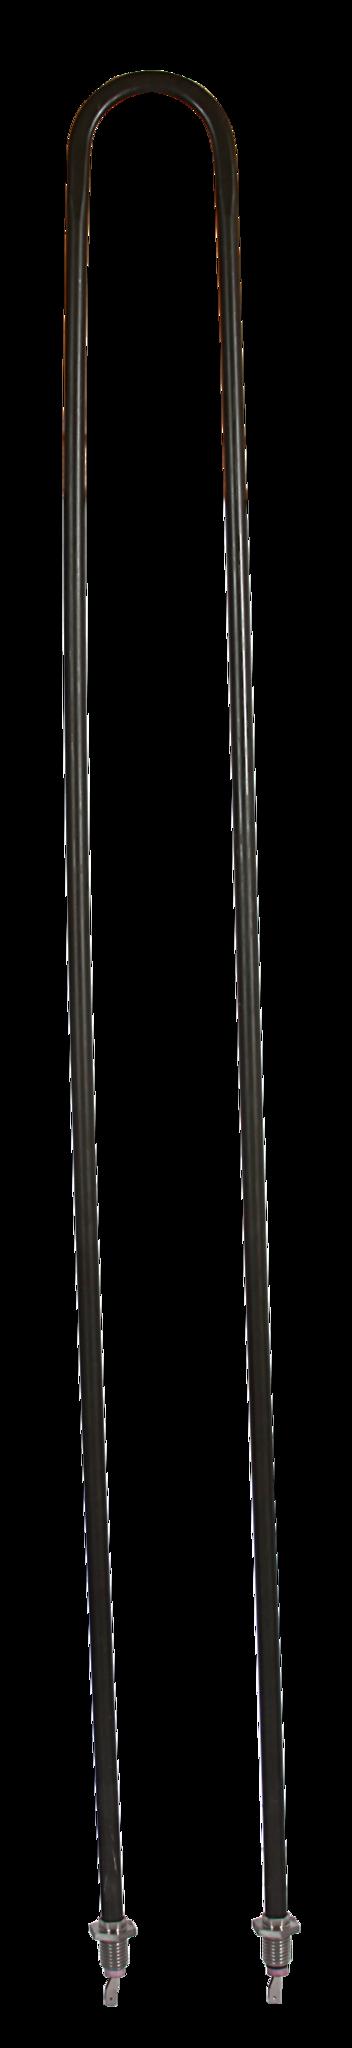 ТЭН-ы: ТЭН SAWO HP41-004 TWR-200 (для печи TOWER 230V, 2000W) запчасти